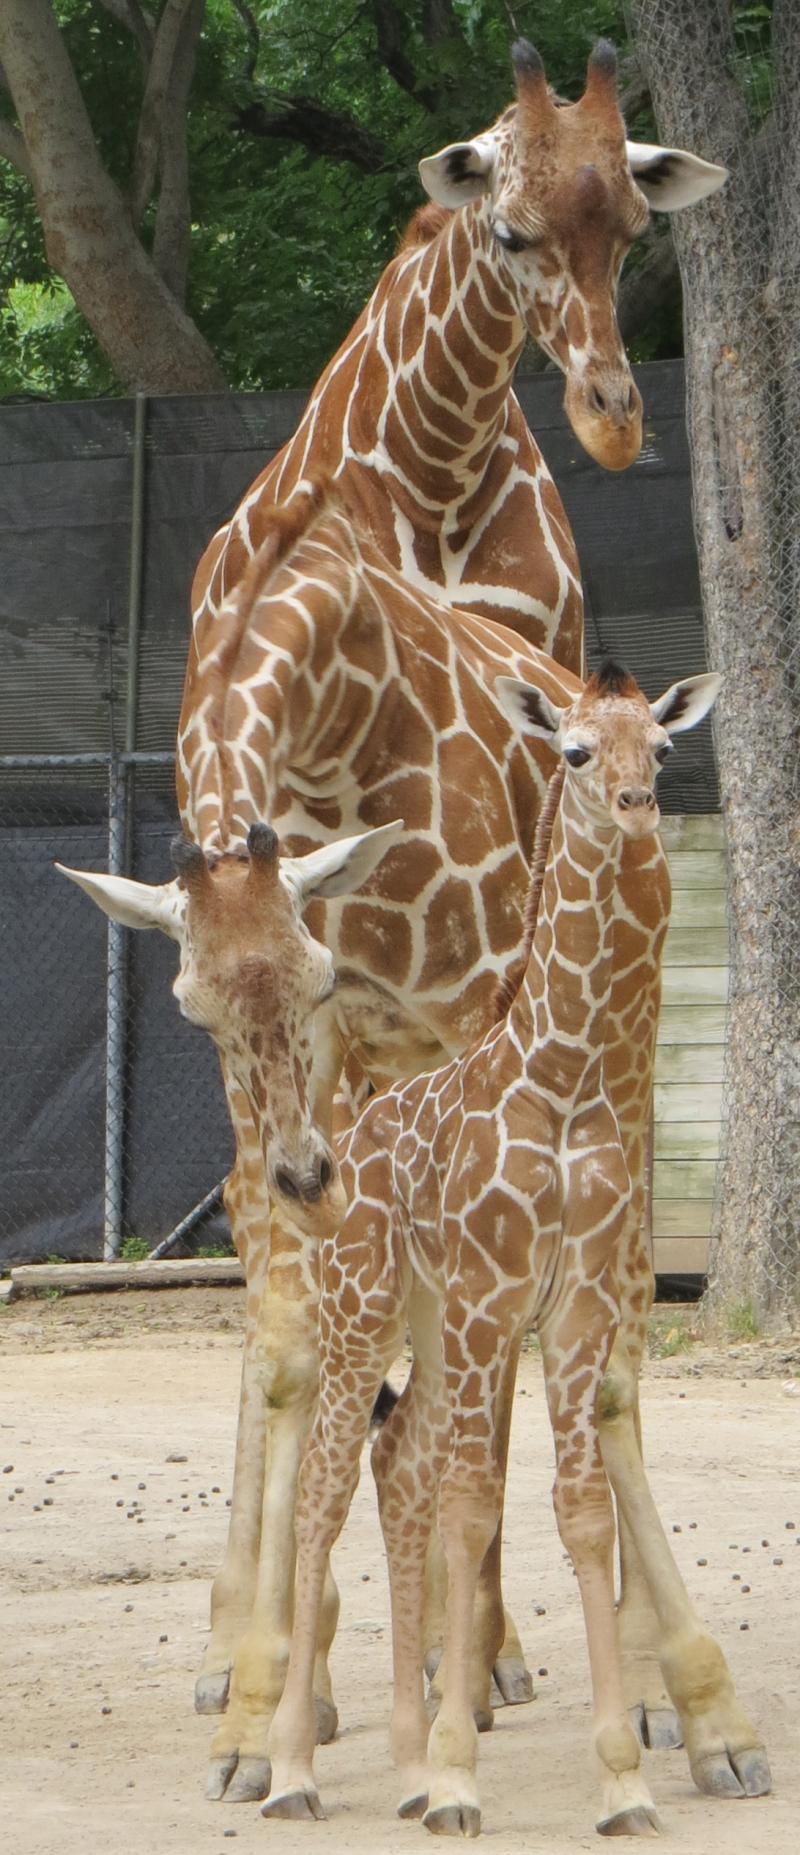 2_FWZ giraffe calf 3